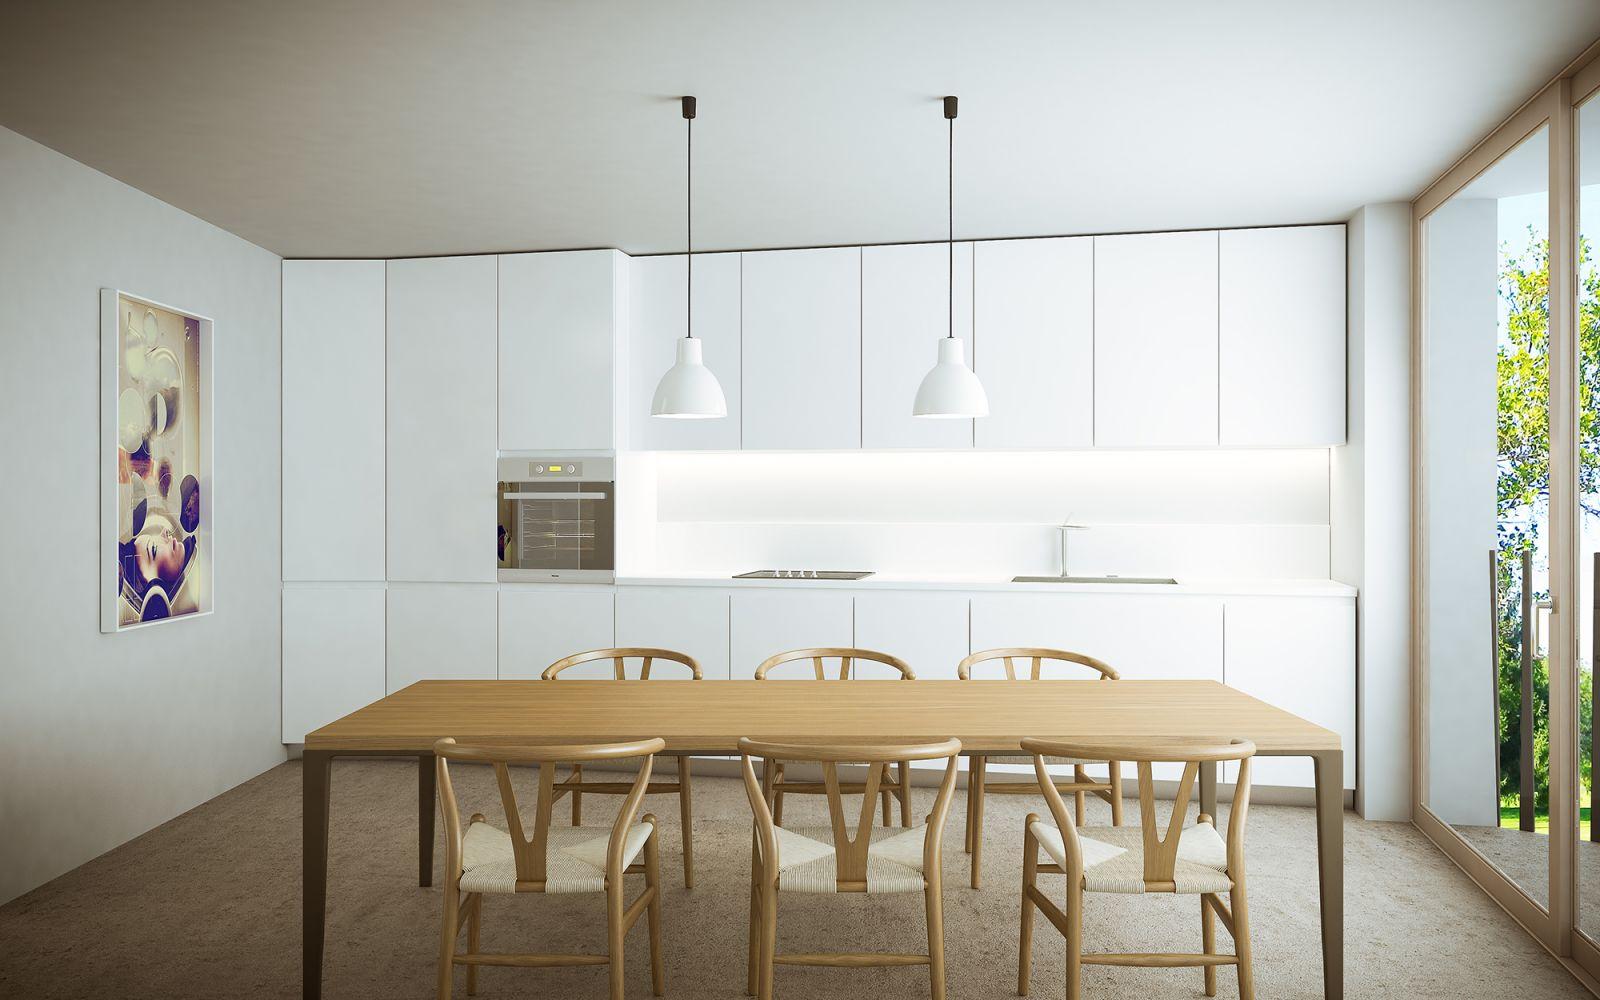 Le Vallon de Villars - Apartments 246